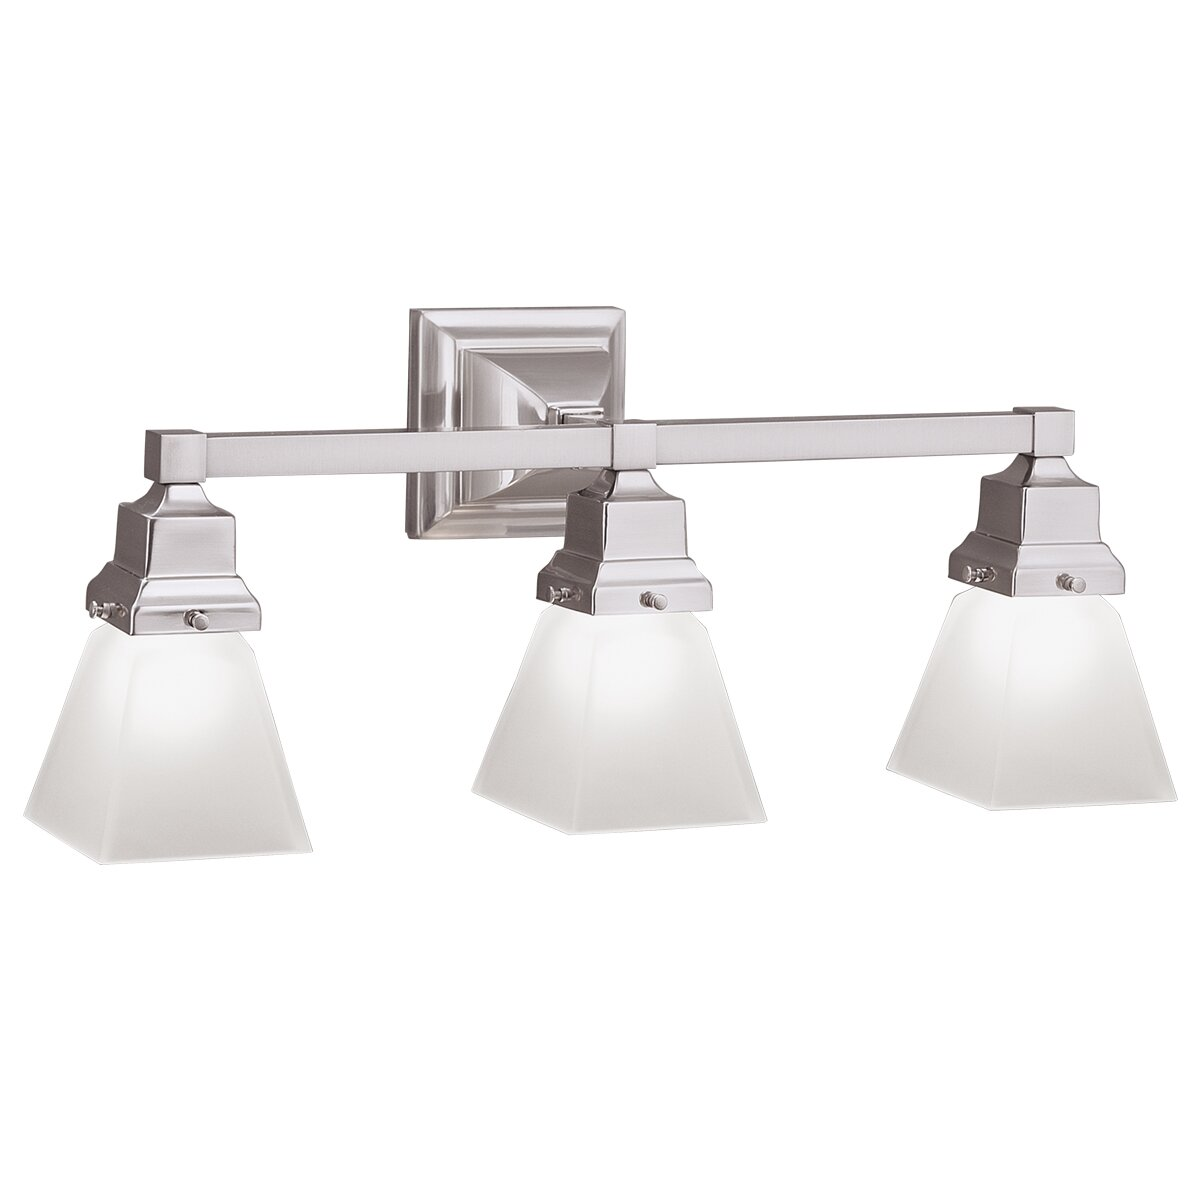 Norwell Lighting Birmingham 3 Light Vanity Light & Reviews